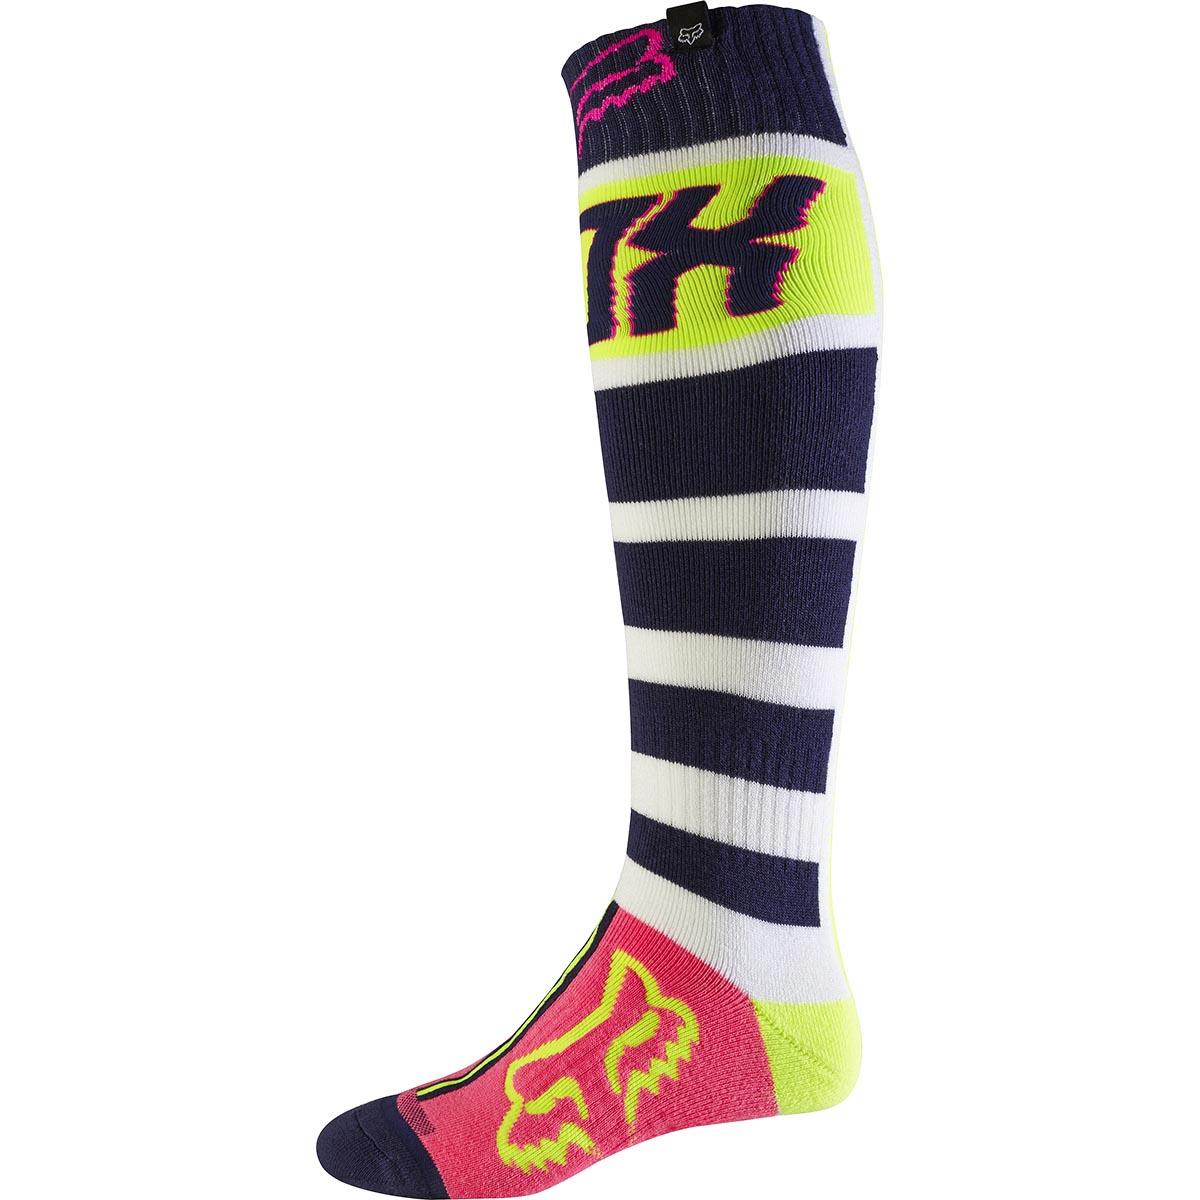 Fox - 2017 FRI Falcon Thick носки плотные, сине-белые